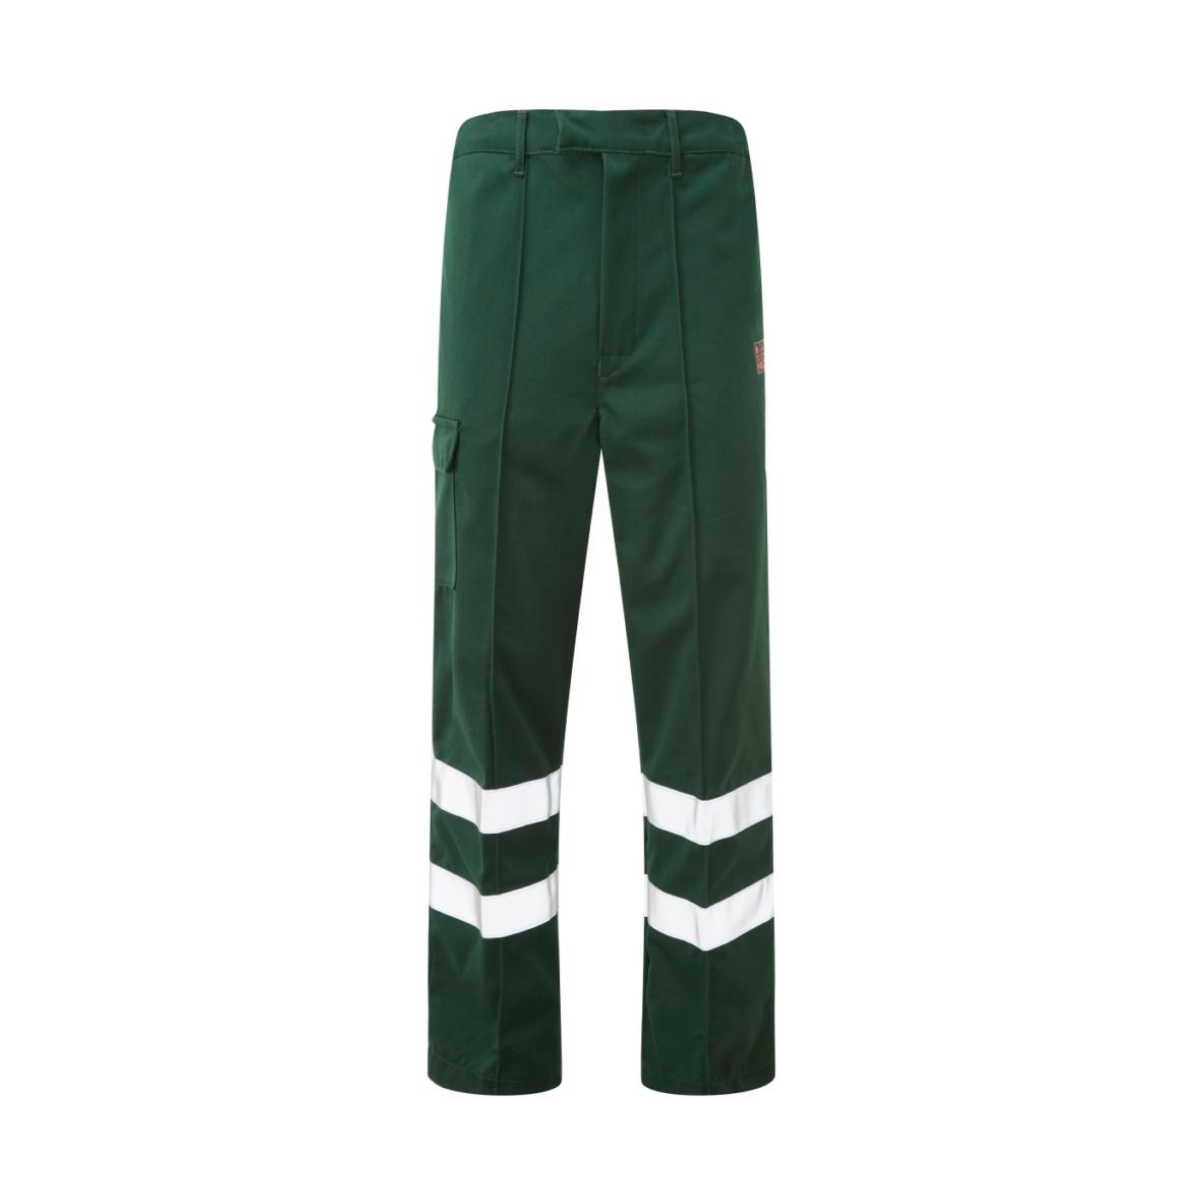 AS2305_HAZTEC® Tengiz FR AS Inherent Green Combat Trousers_Front